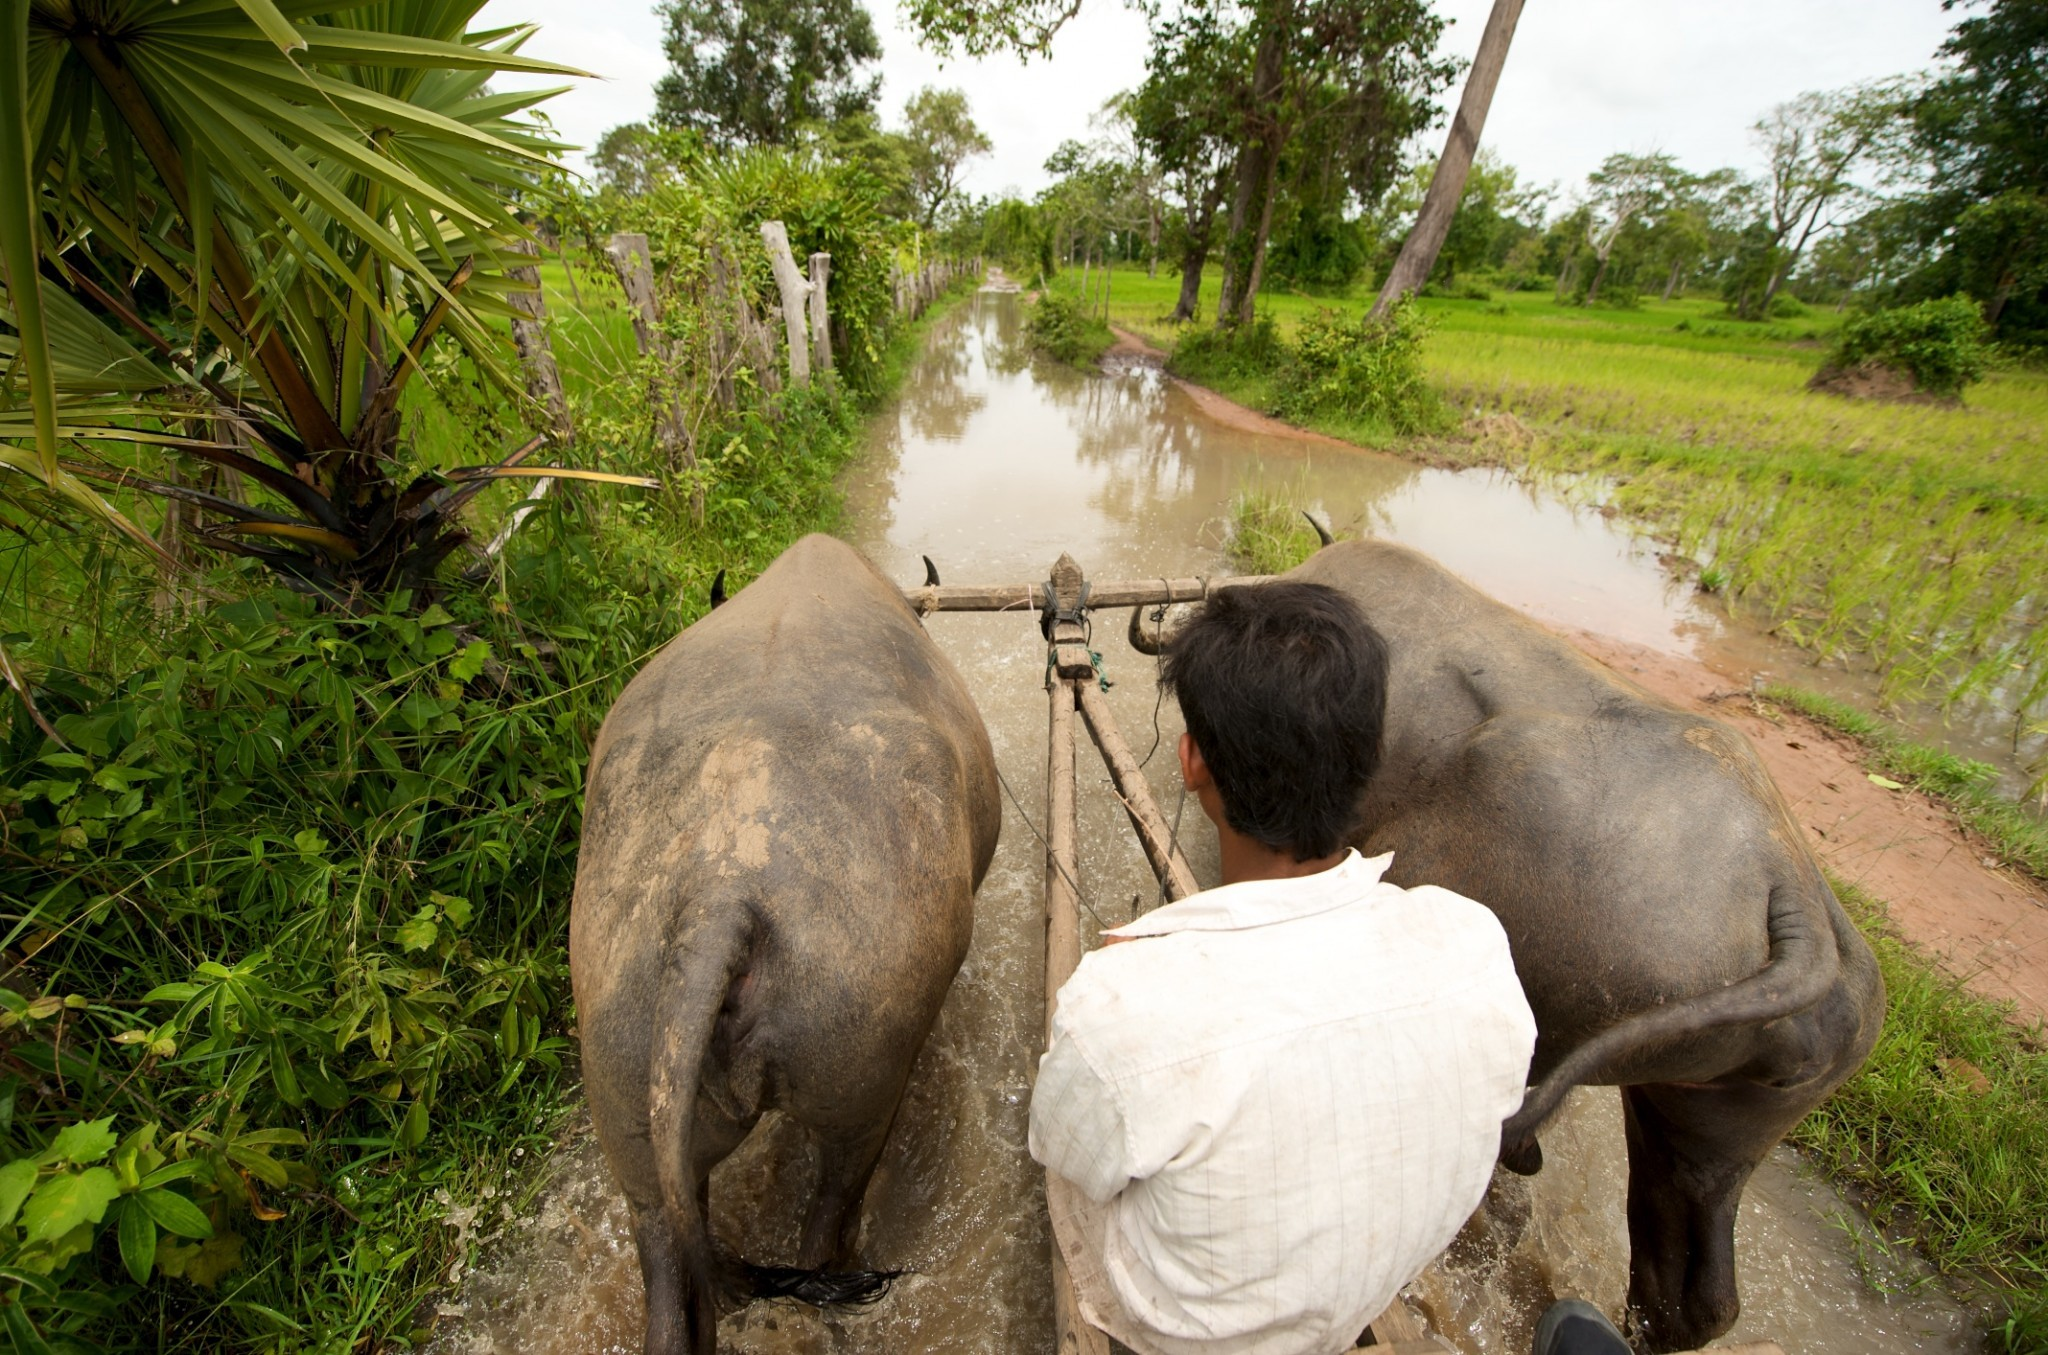 AlexSoh_July09 Cambodia167